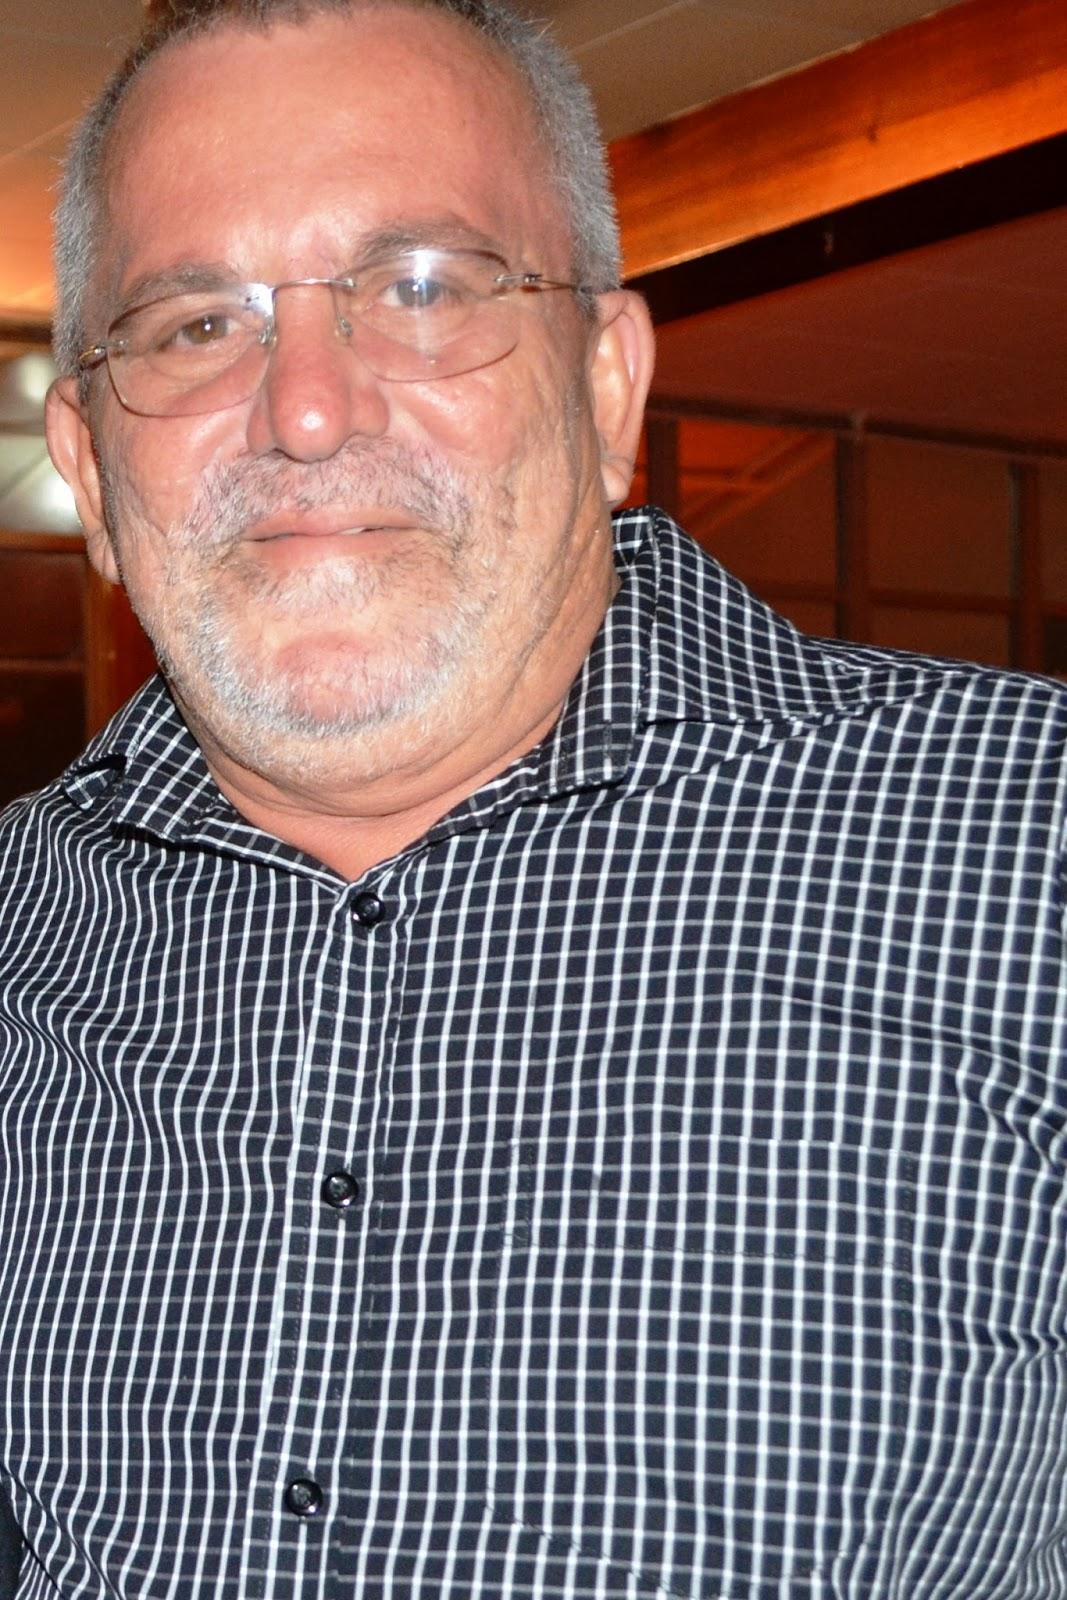 CLUBES – Entrevista Jorge Mira – Comodo do Jurujuba Iate Clube